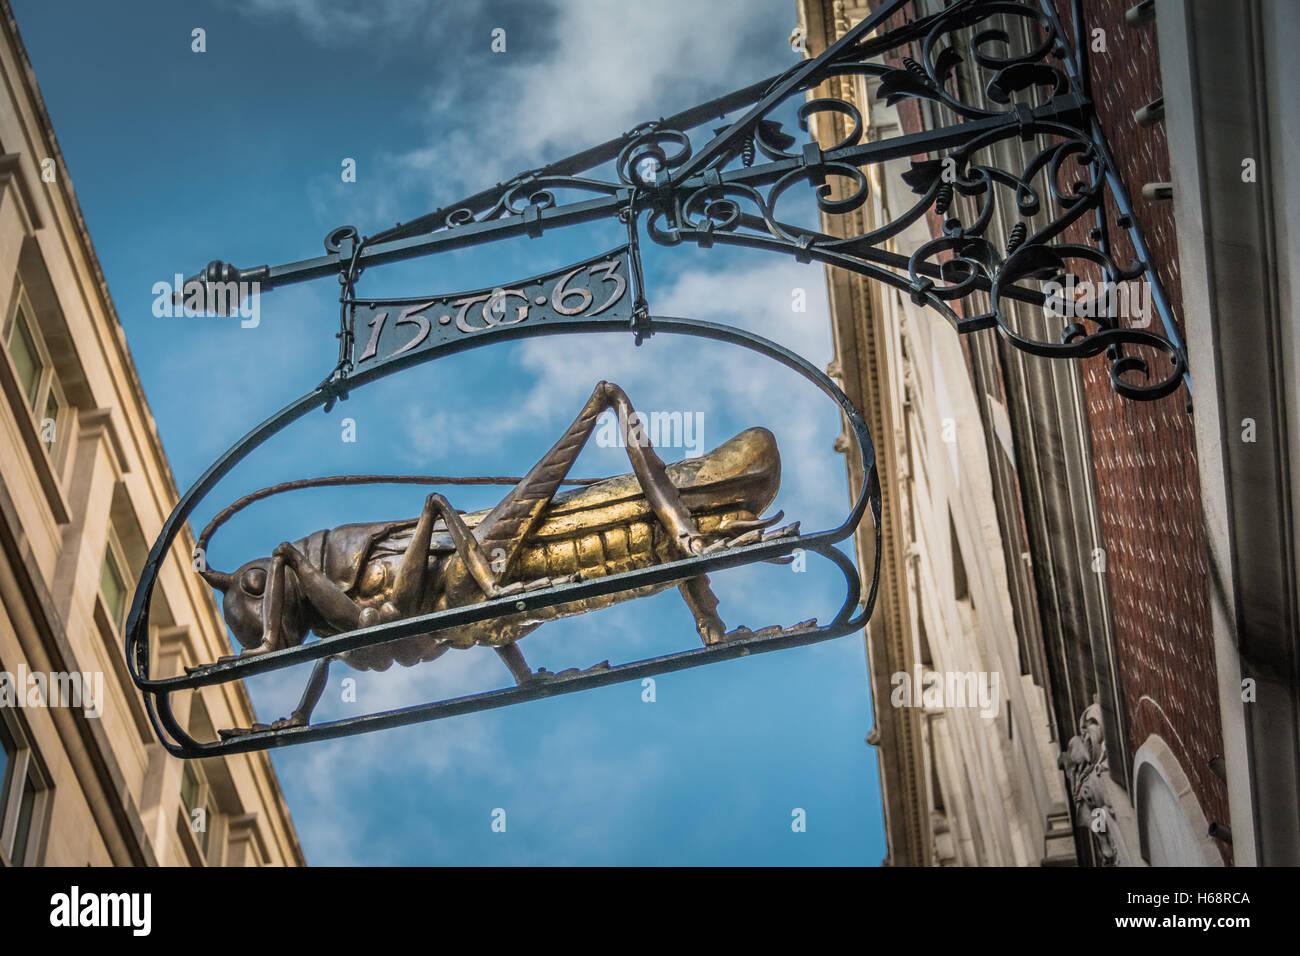 The Gresham gilded grasshopper at 68 Lombard Street, London, EC3, UK - Stock Image